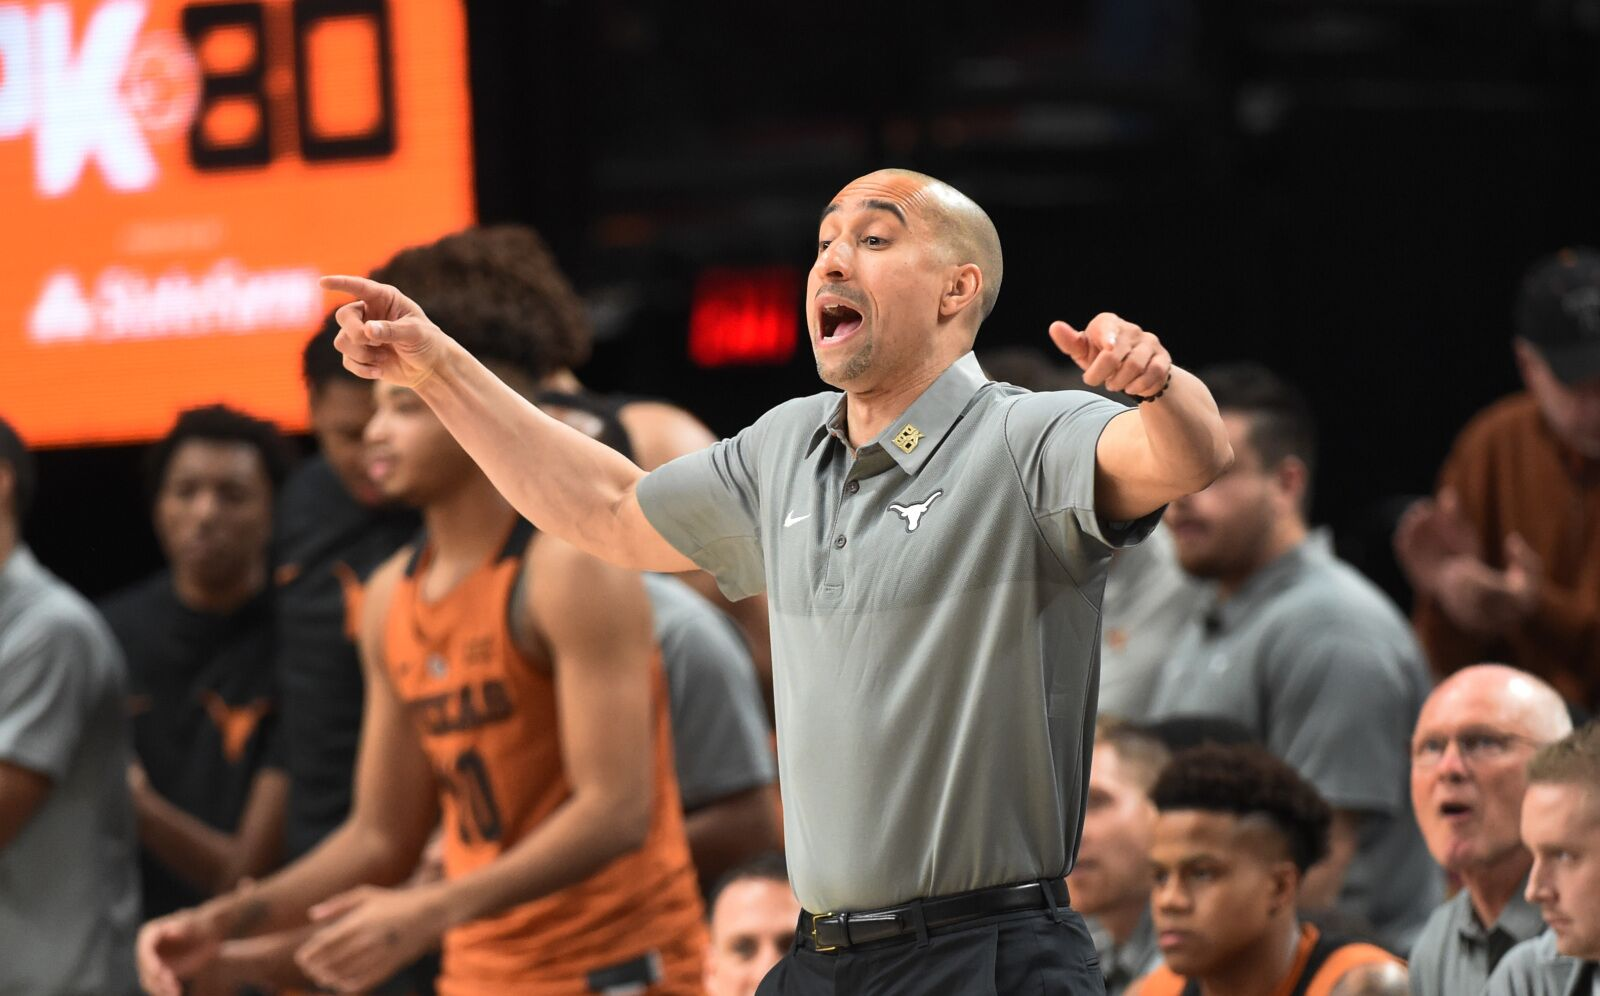 NCAA Basketball Recruiting: 2020 prospect Greg Brown set to visit Memphis, Kentucky